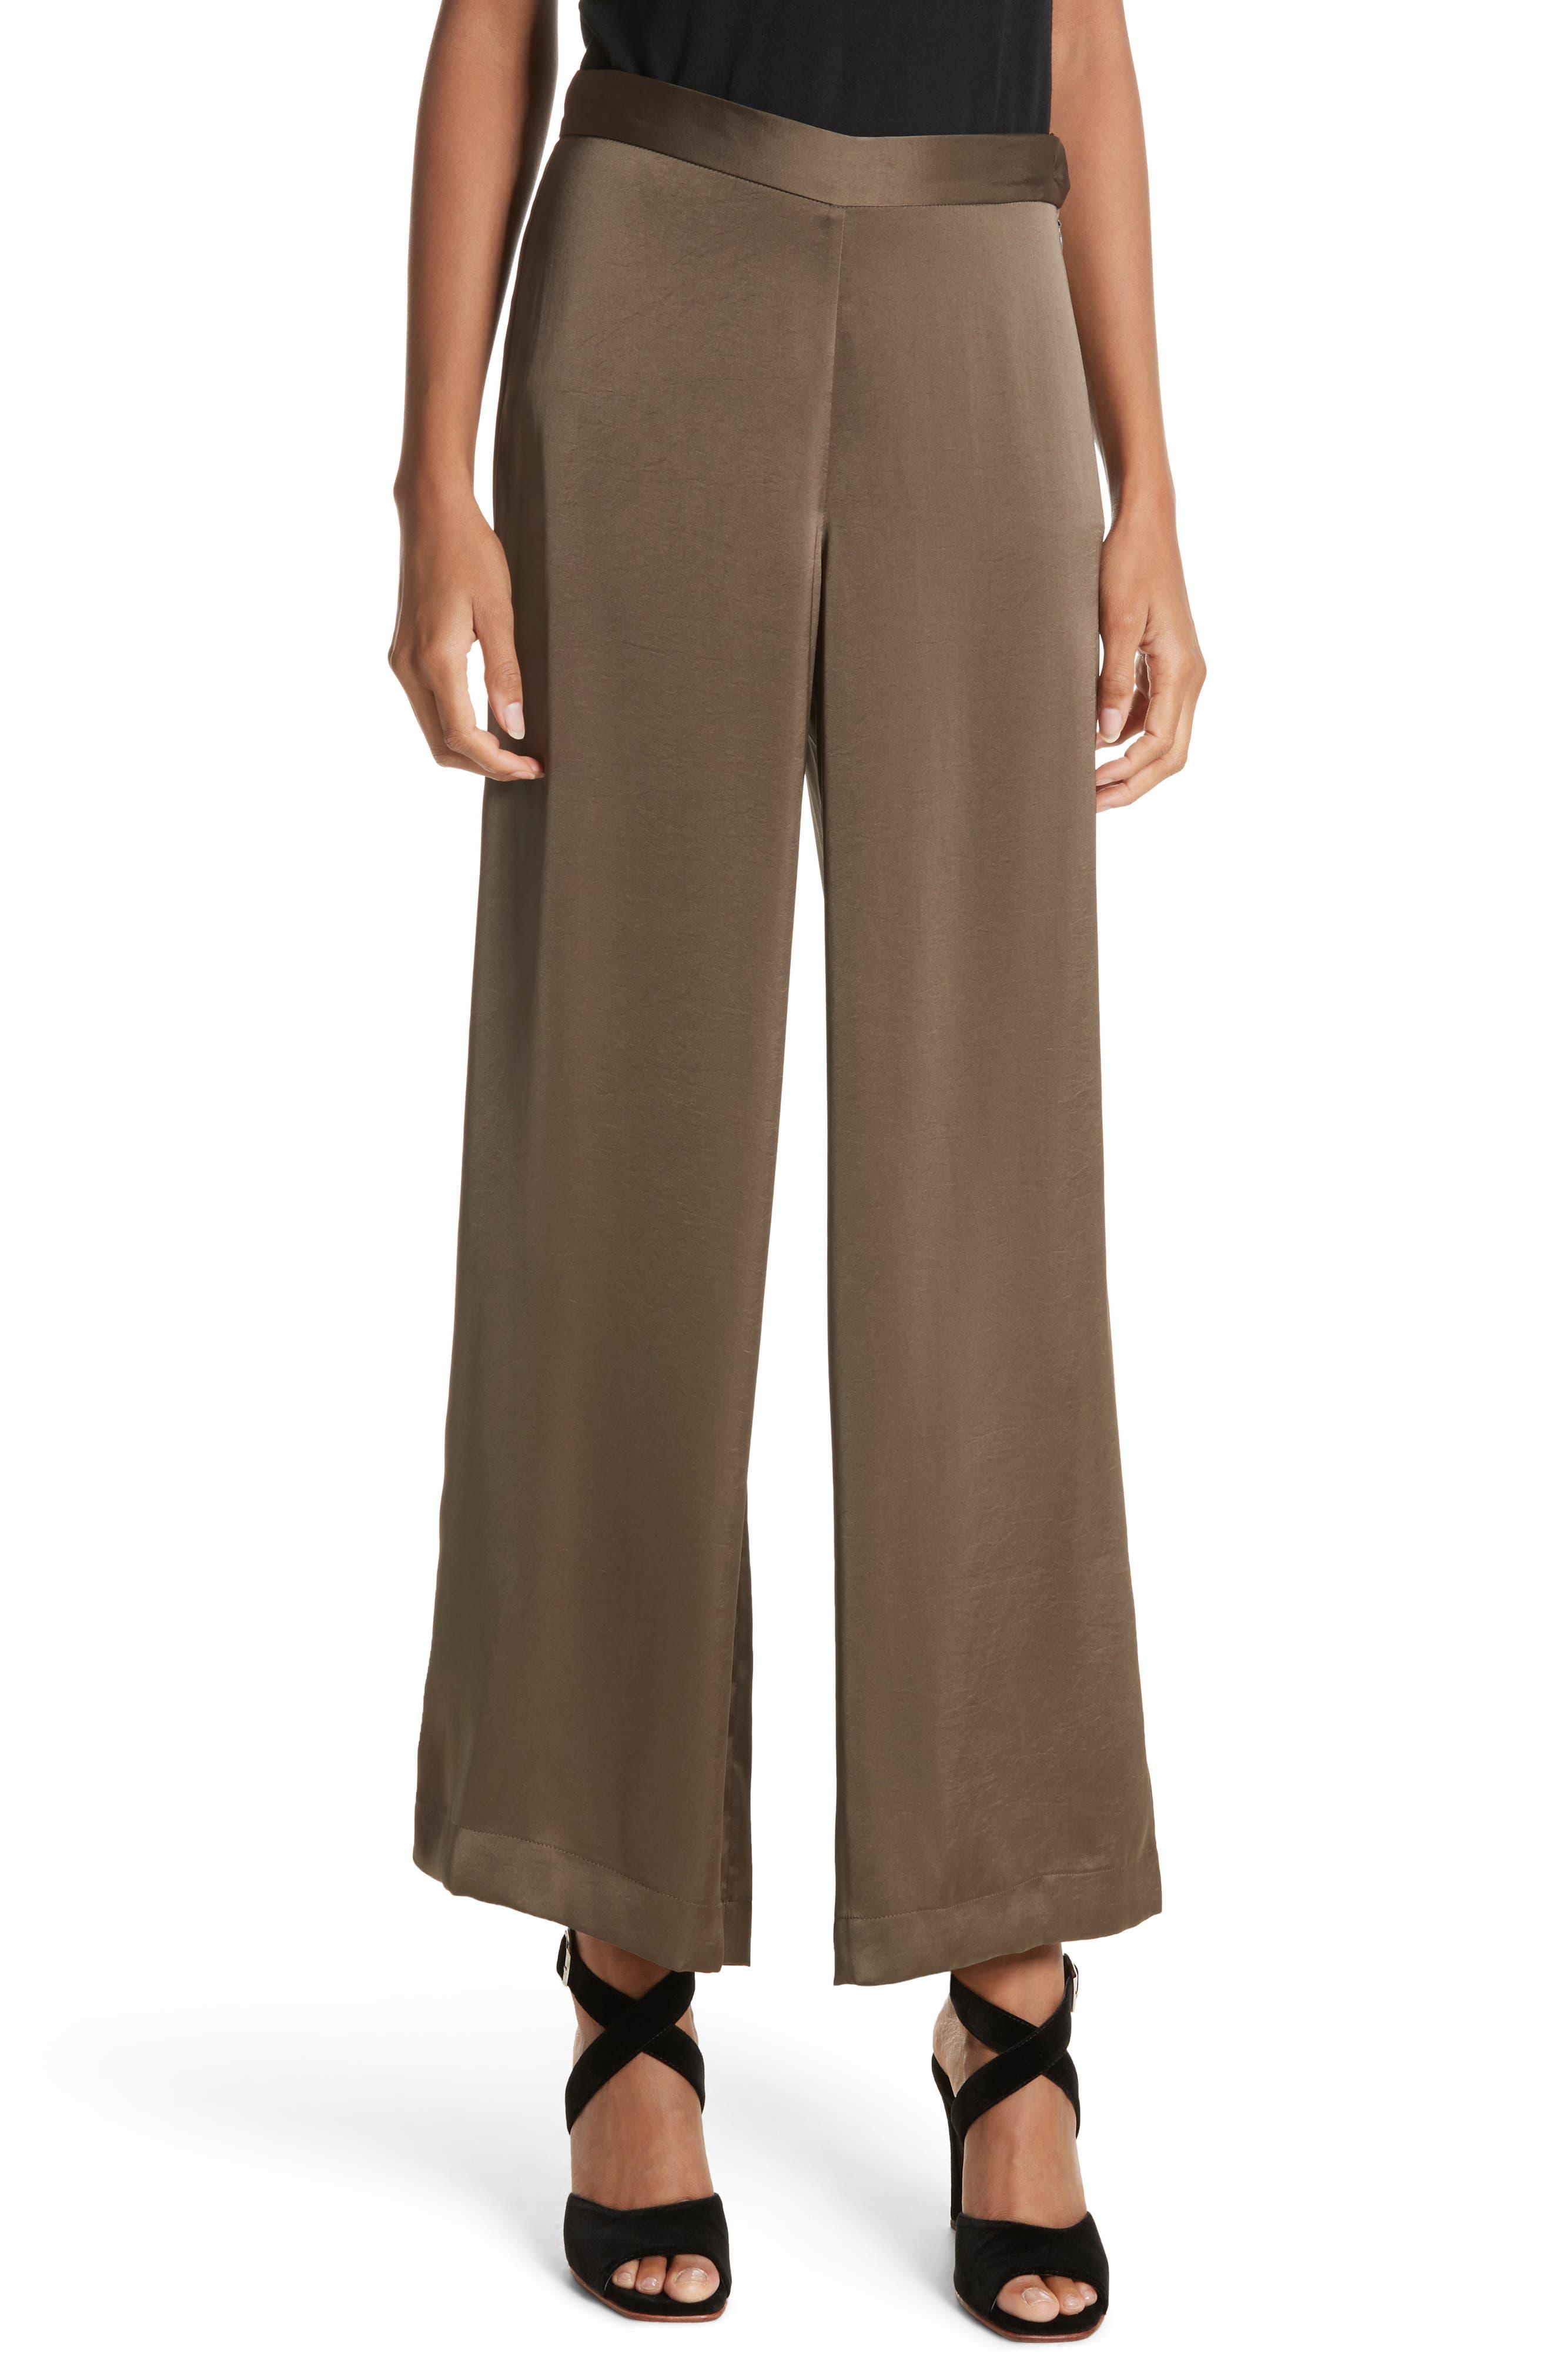 Alternate Image 1 Selected - Rachel Comey Cleric Satin Wide Leg Pants